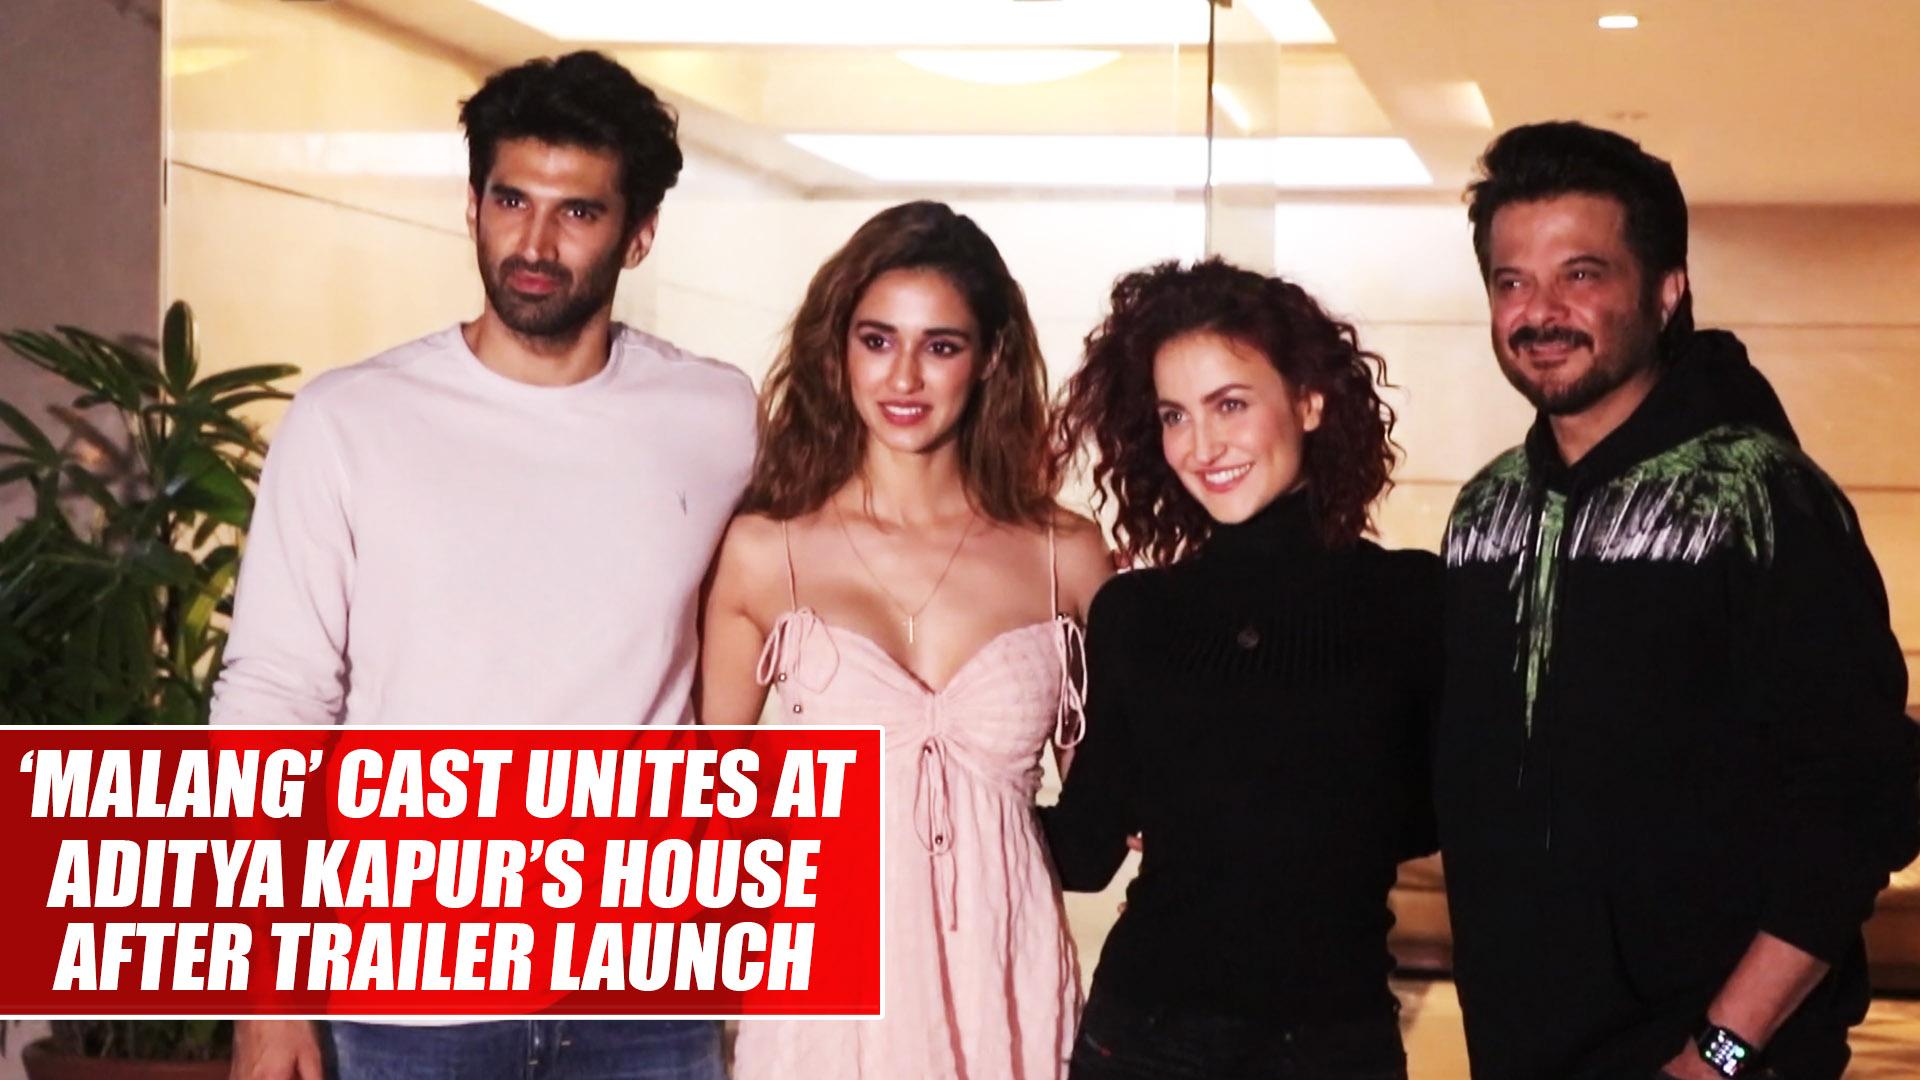 Malang Cast Unites At Aditya Kapur S House After Trailer Launch